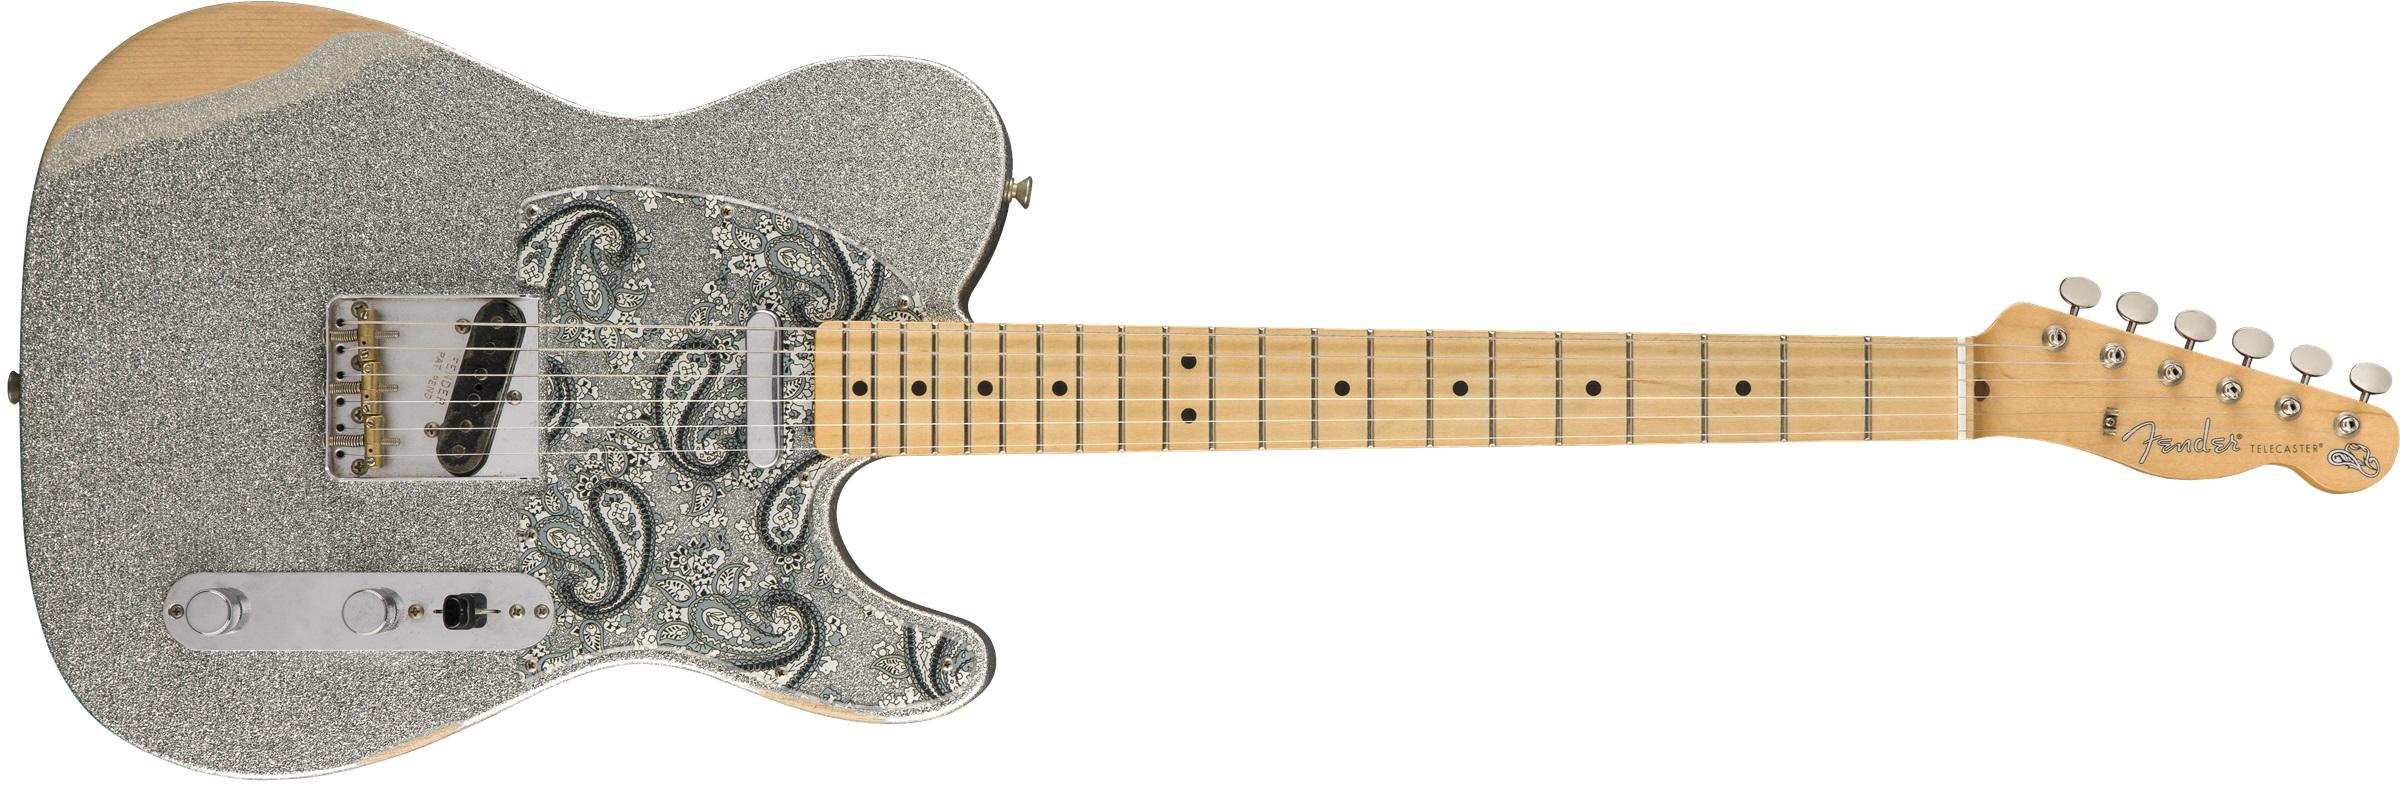 Fender Brad Paisley Road Worn Telecaster MN SLV